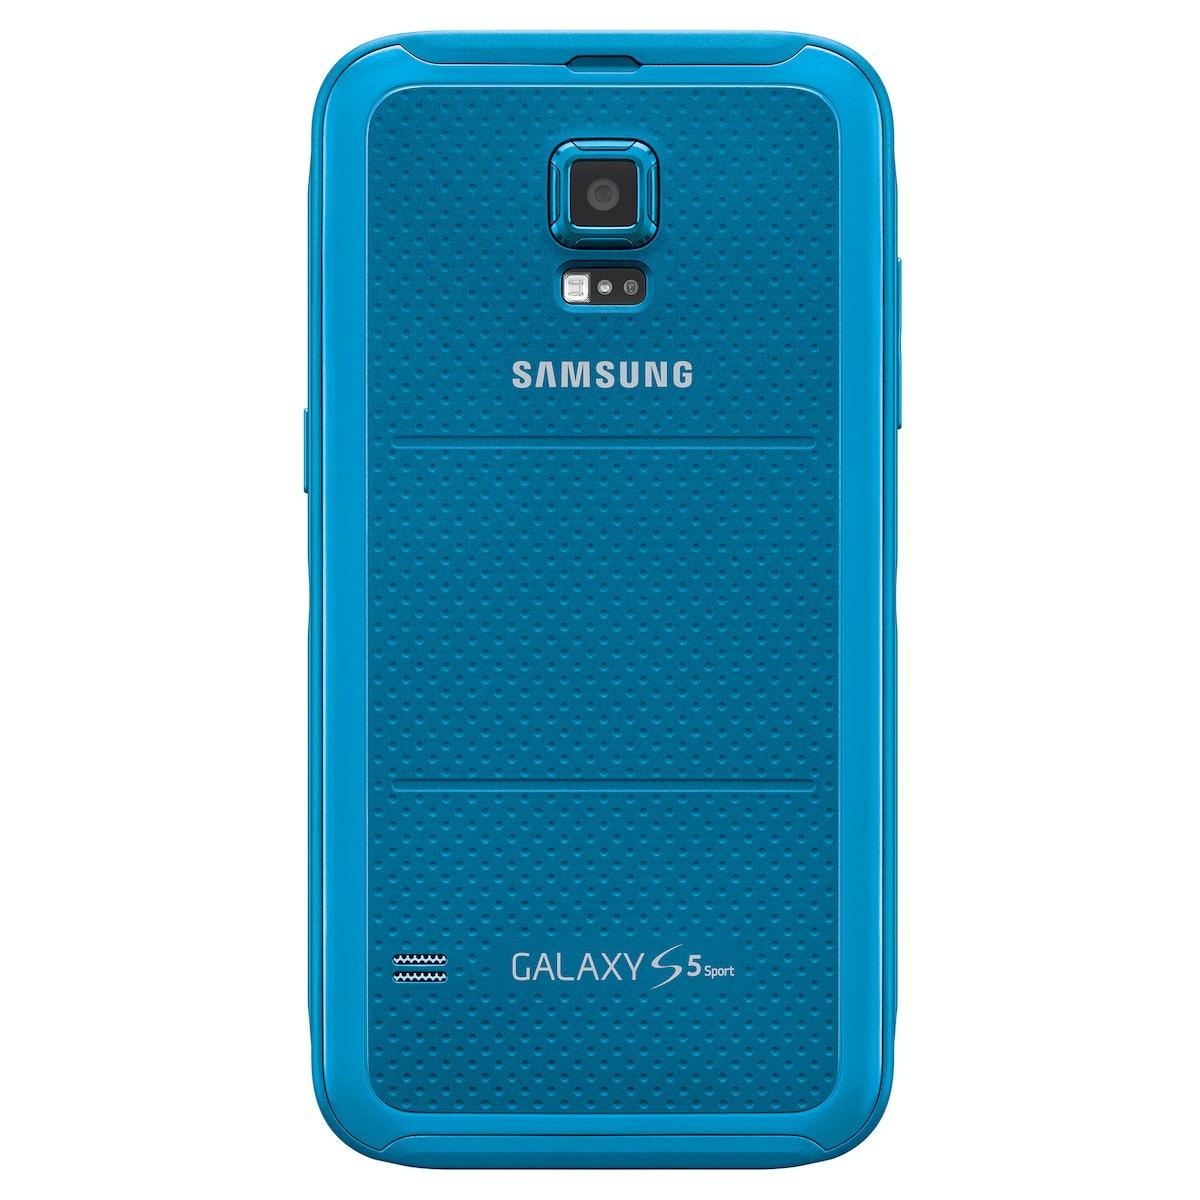 Samsung Galaxy S5 Sport smartphone